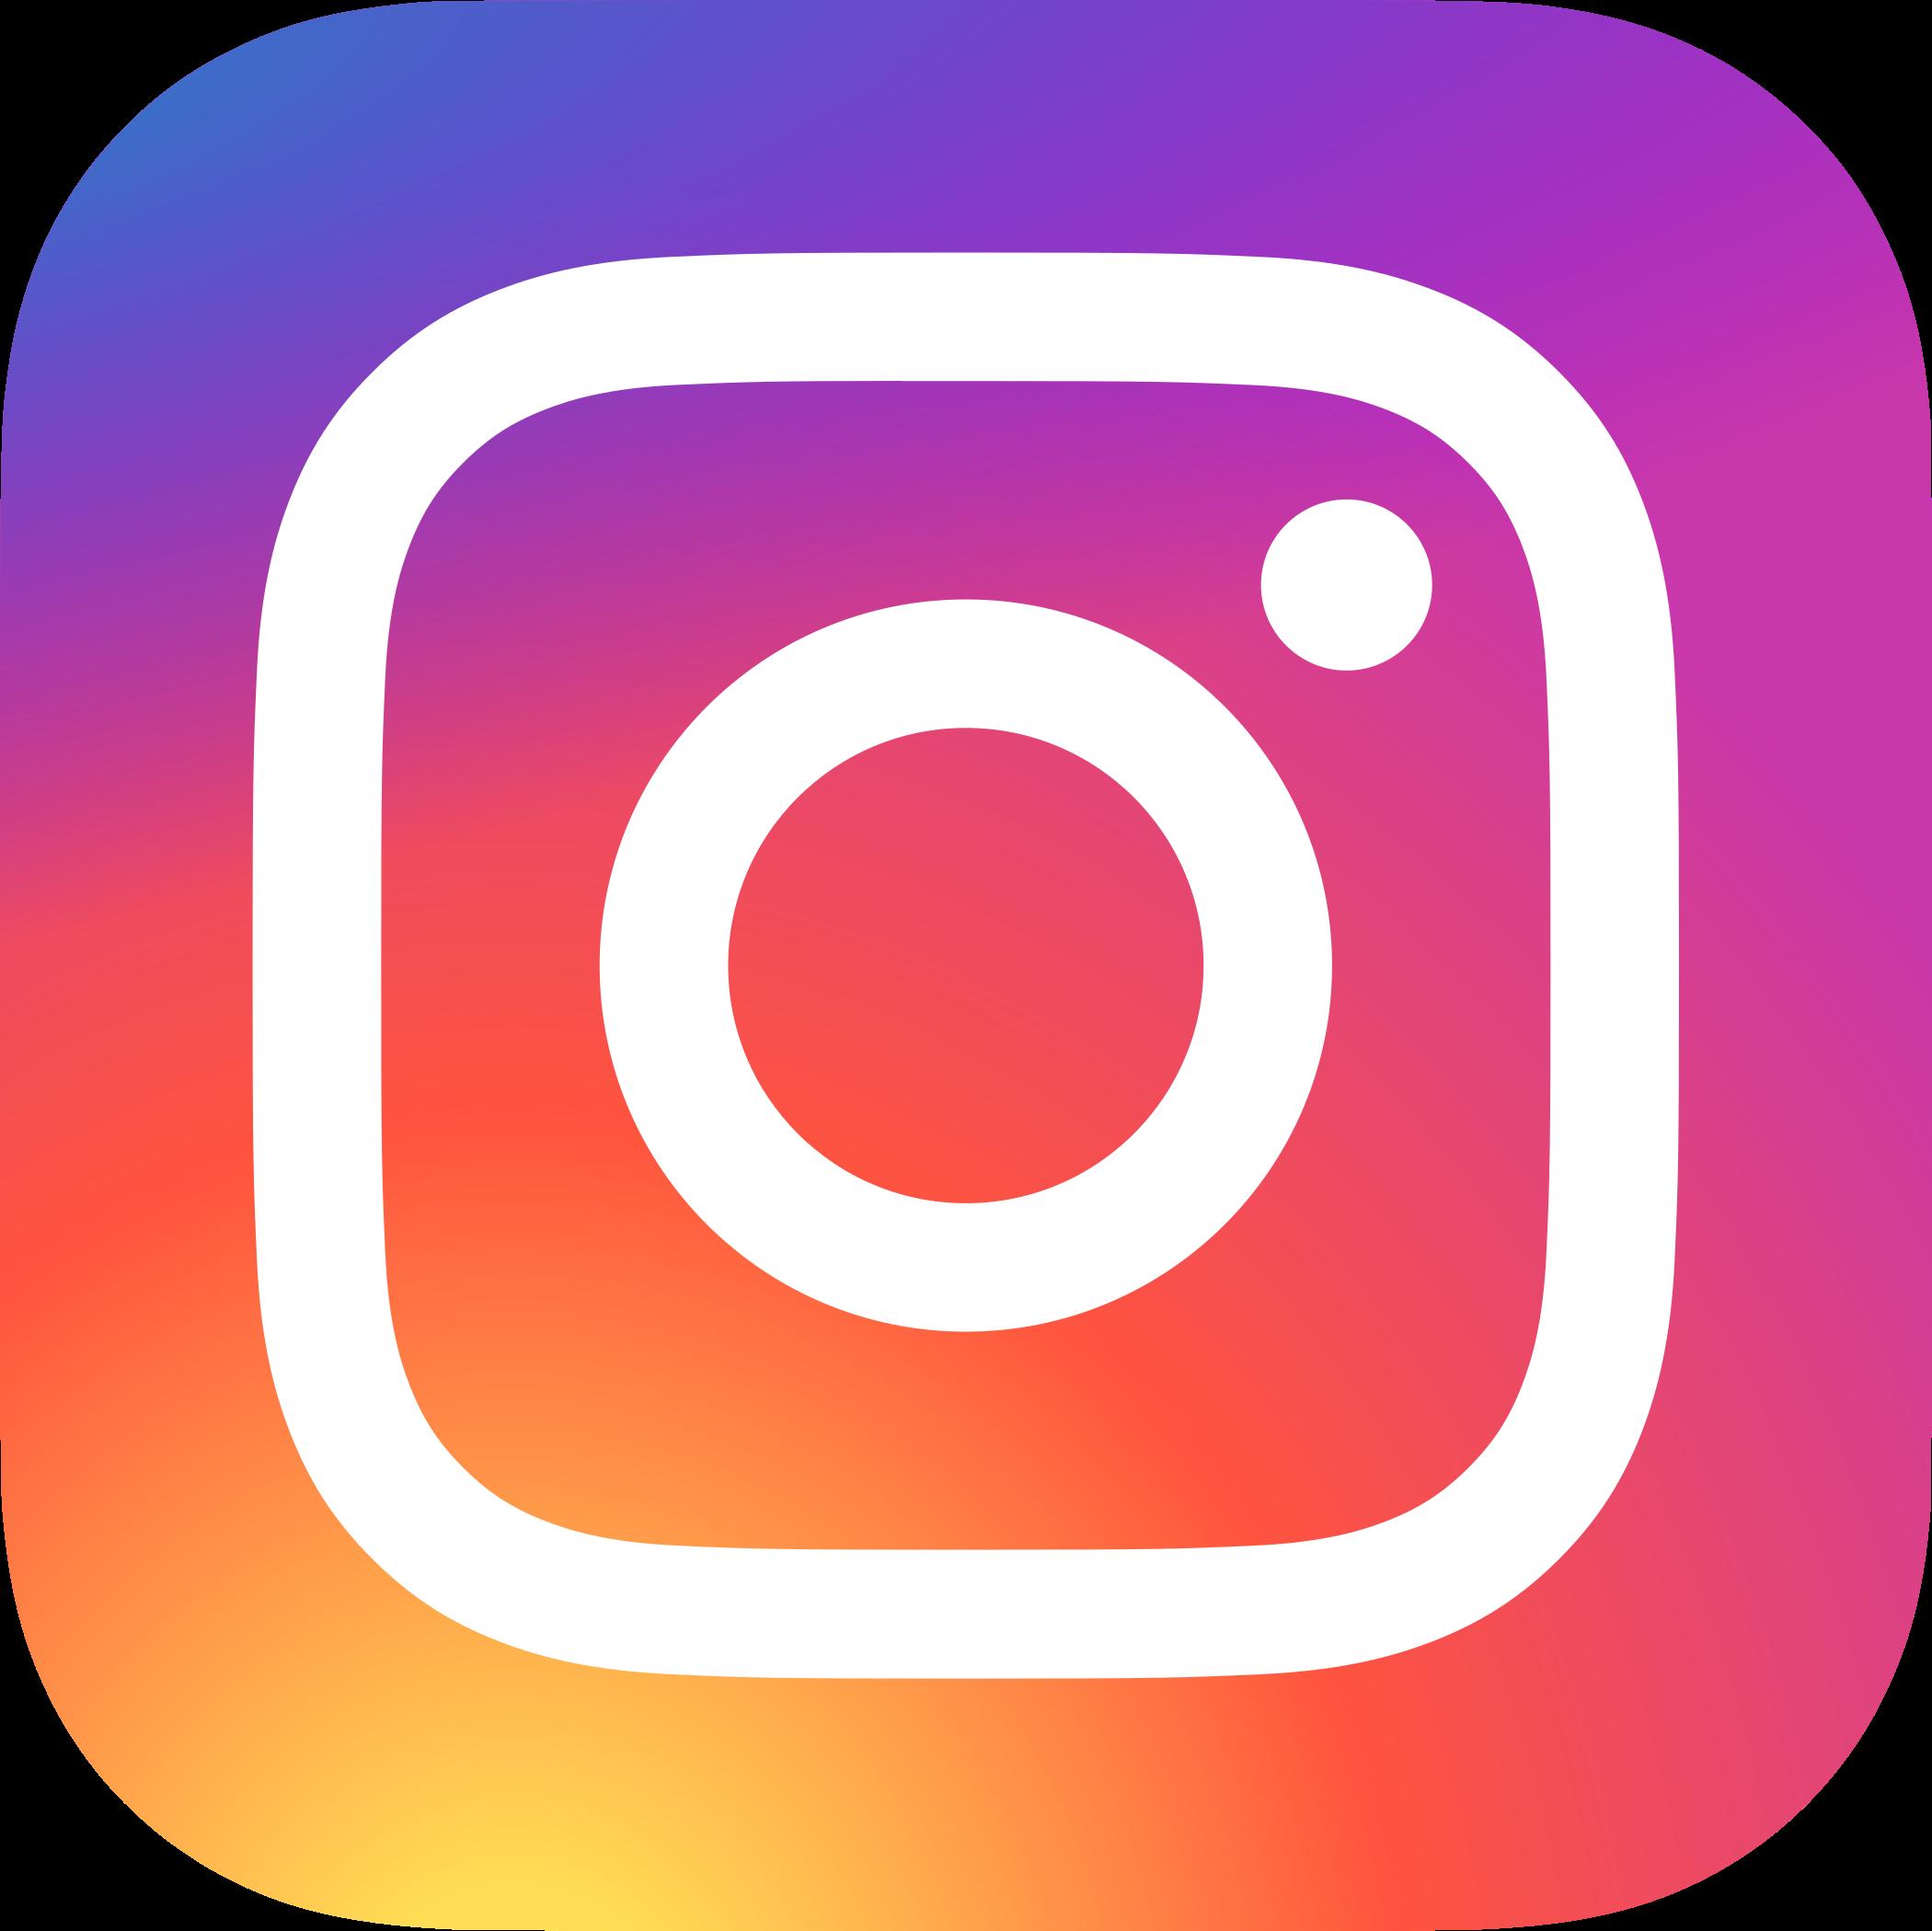 Lien compte Instagram de Hadenn